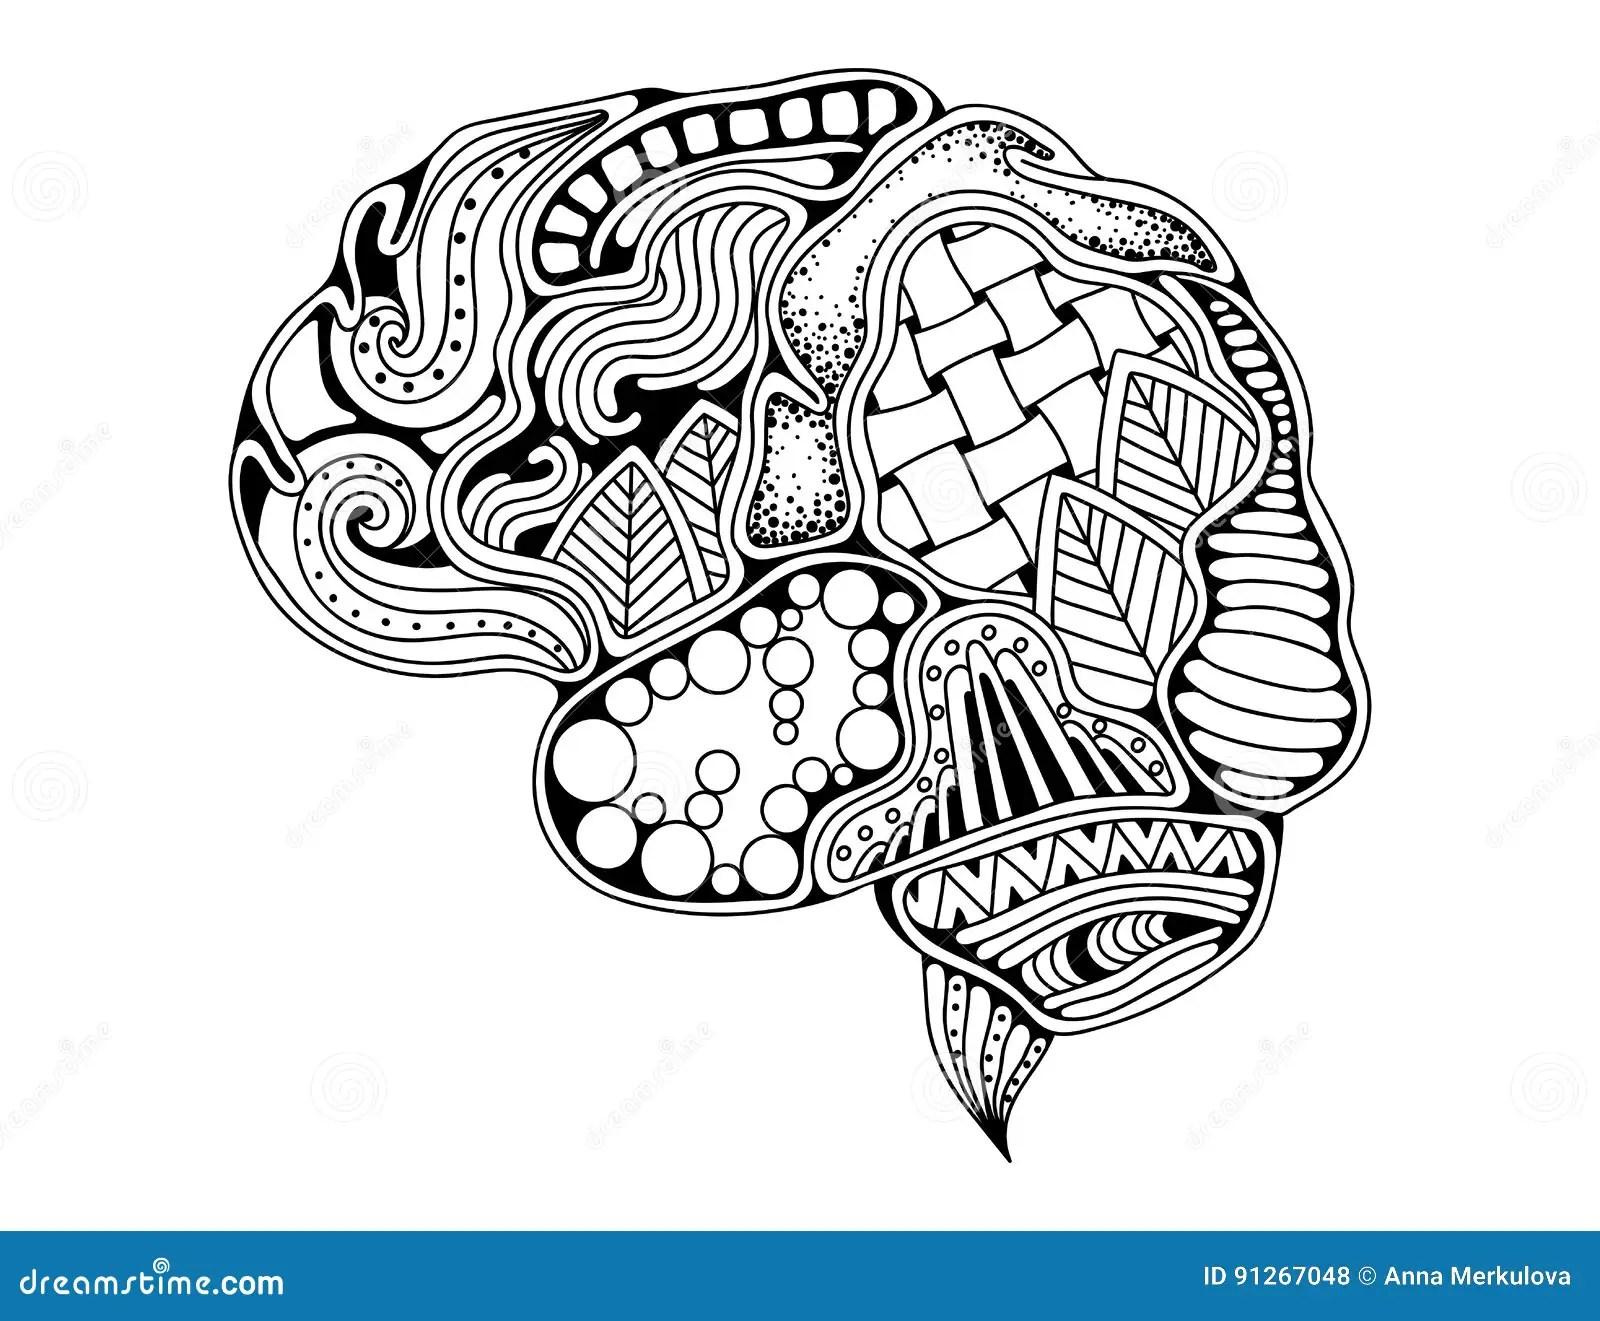 Human Brain Doodle Decorative Curves Creative Mind Stock